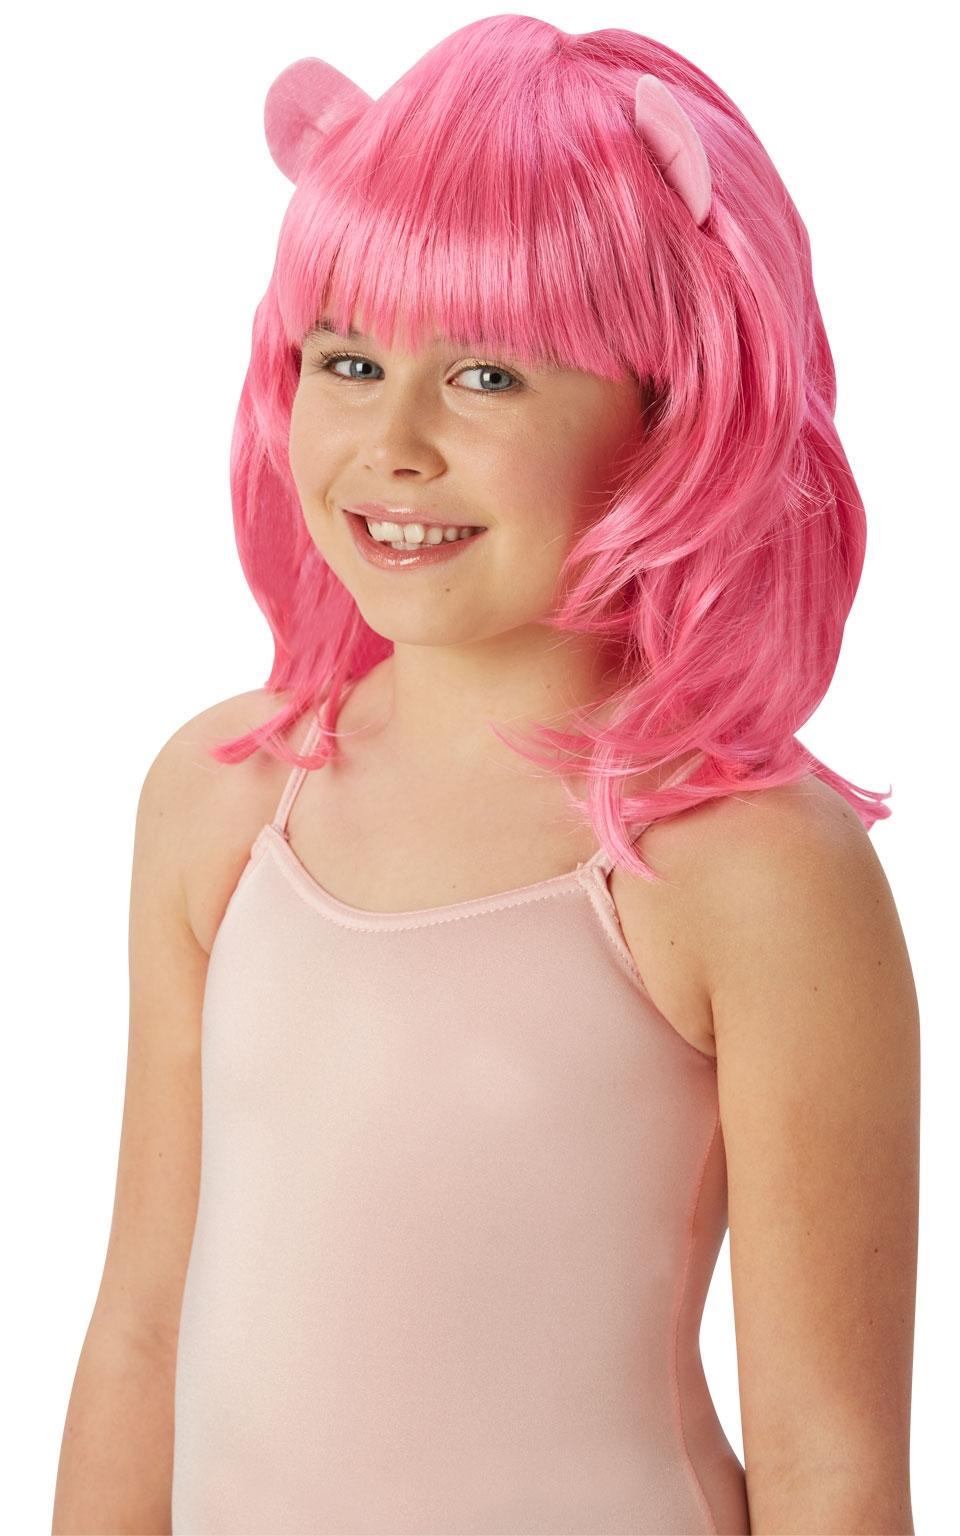 Парик Пинки Пай из My Little Pony (46) - Парики и волосы, р.46